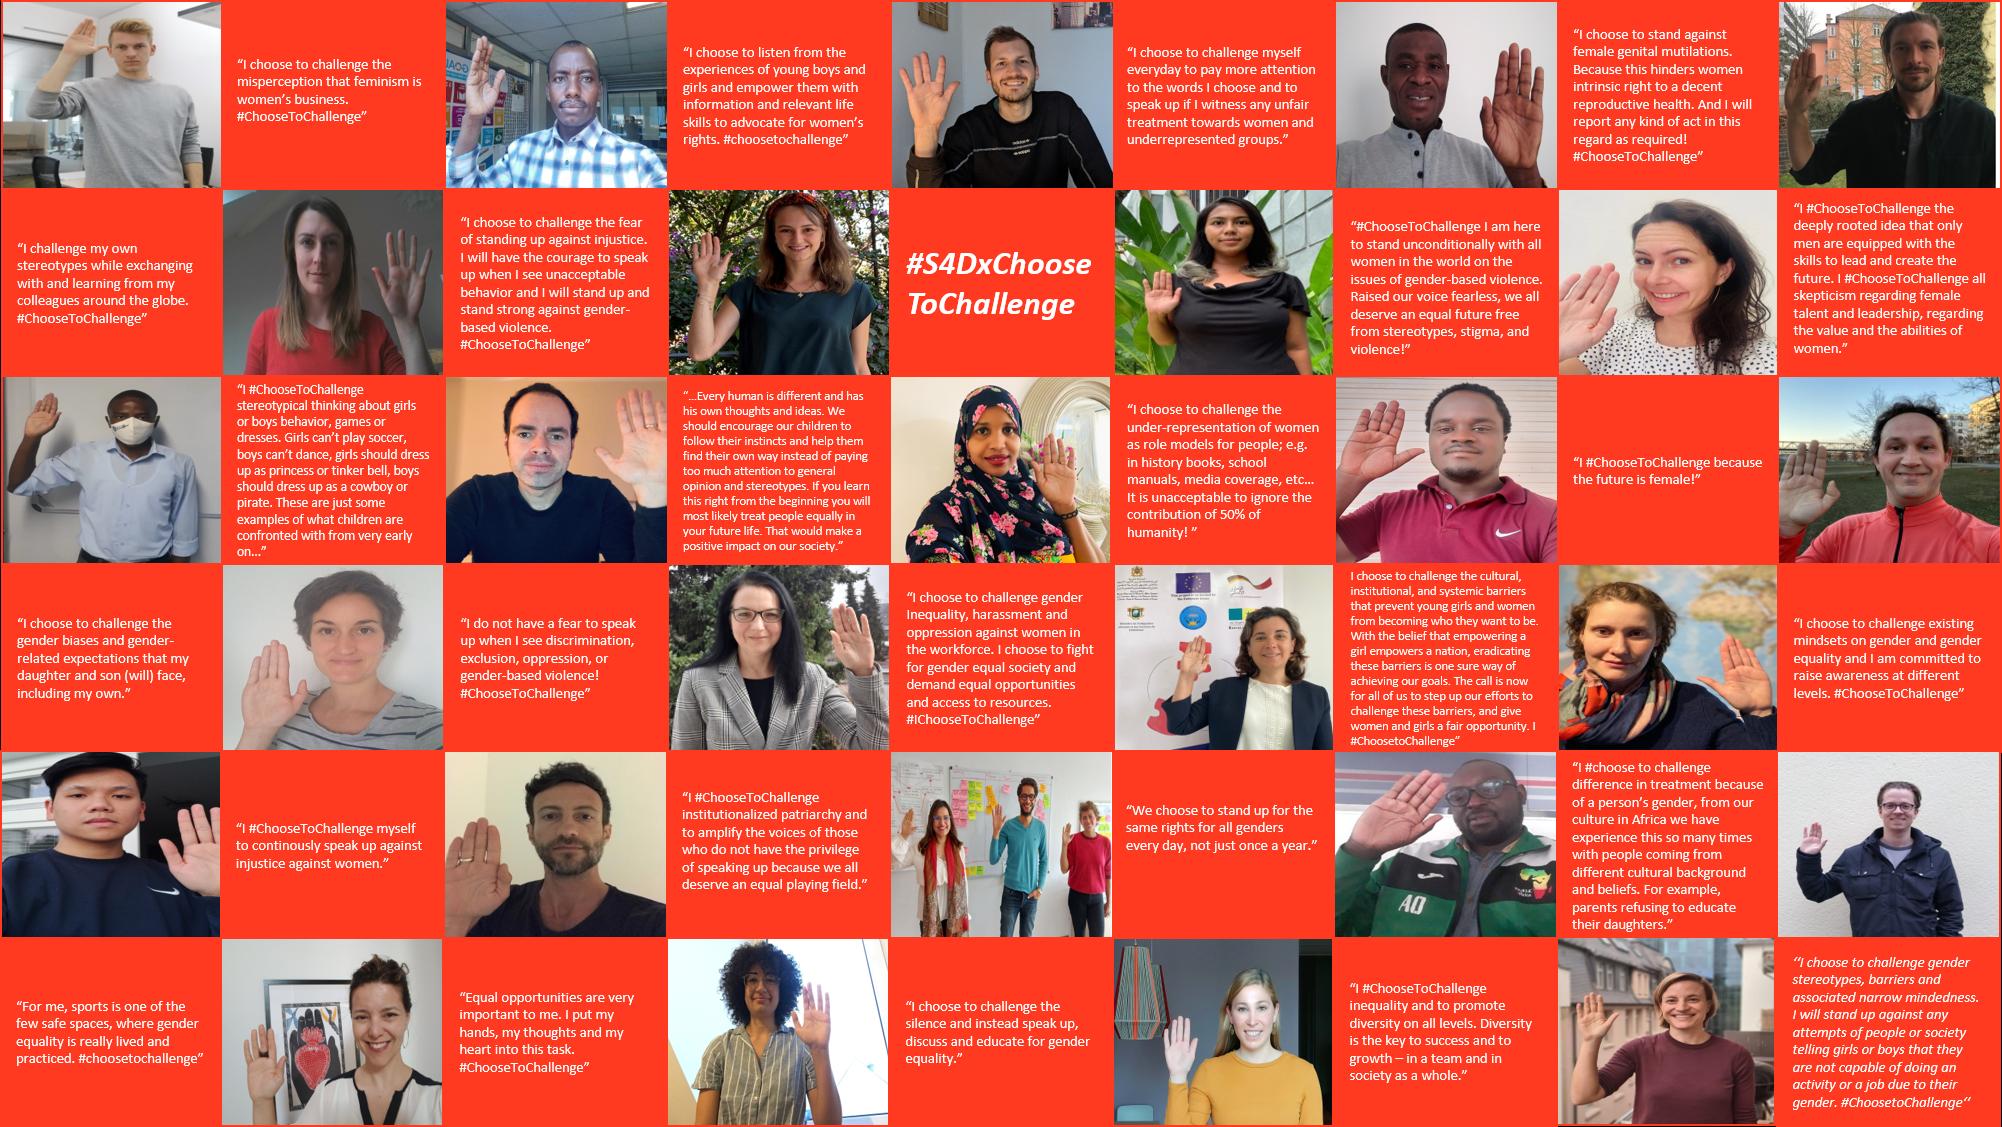 Campaign collage for #ChooseToChallenge. Photo©GIZ